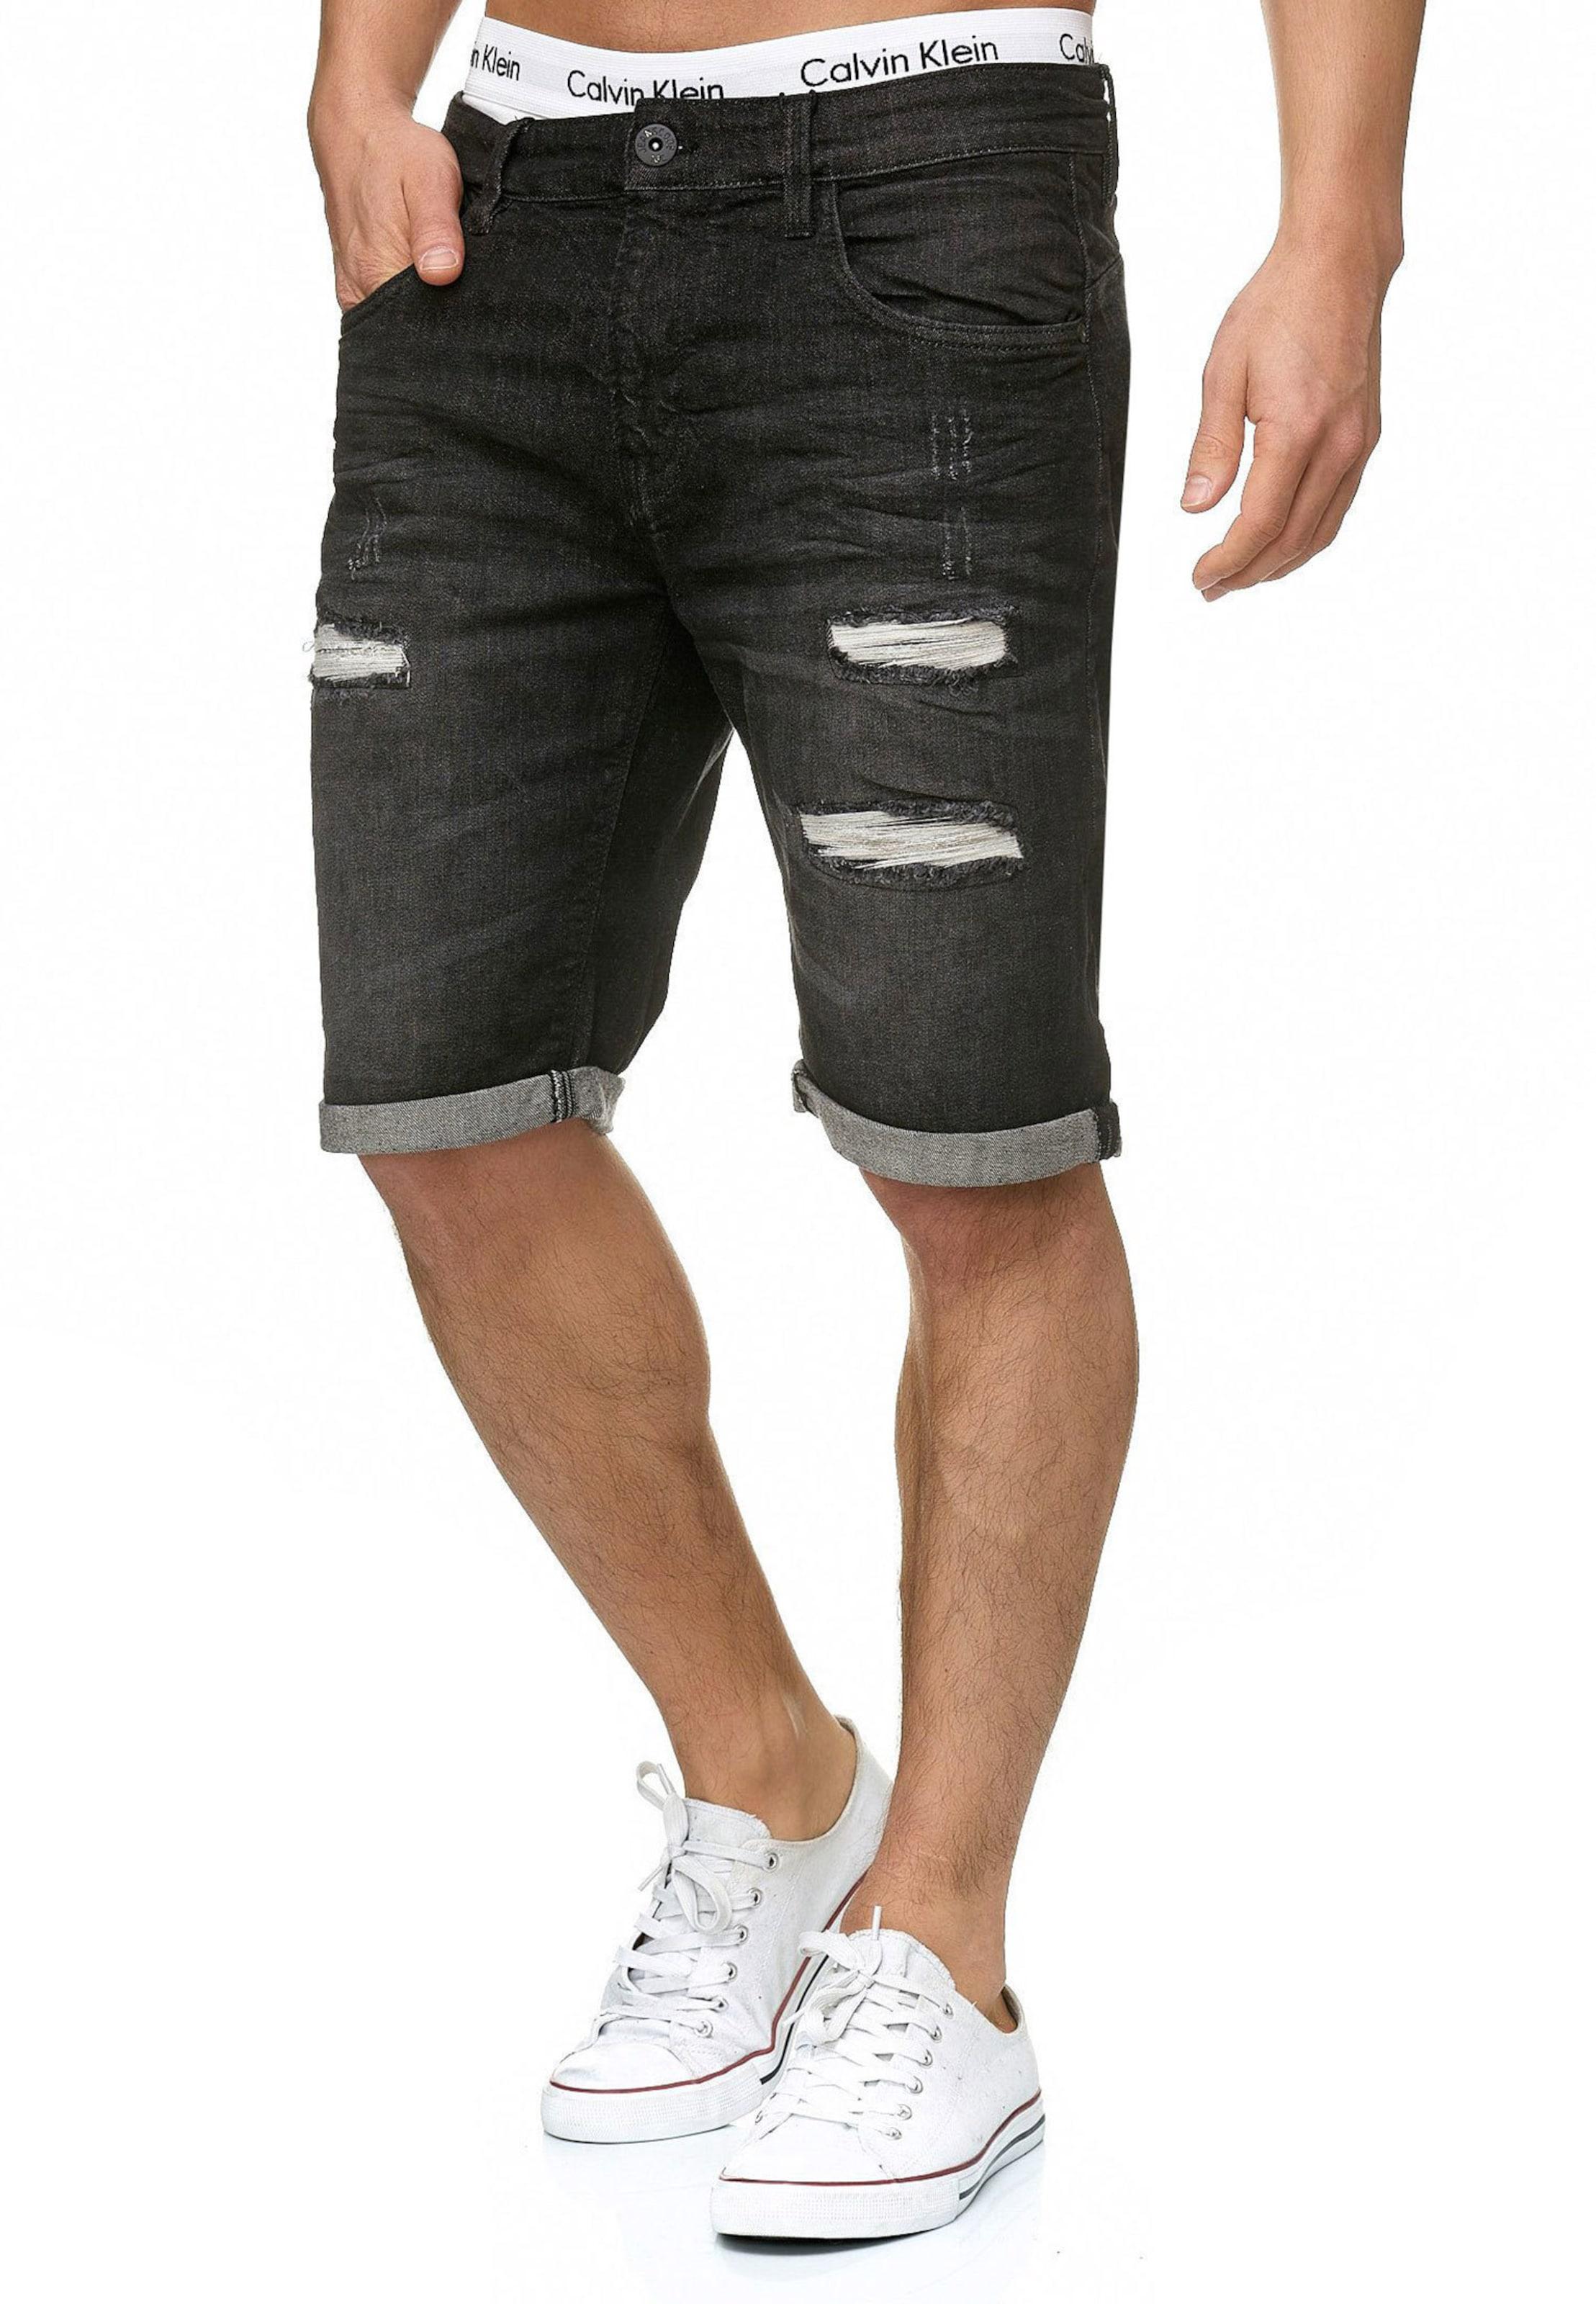 Jeans 'caden' Indicode Shorts Graphit In ALcRj534Sq